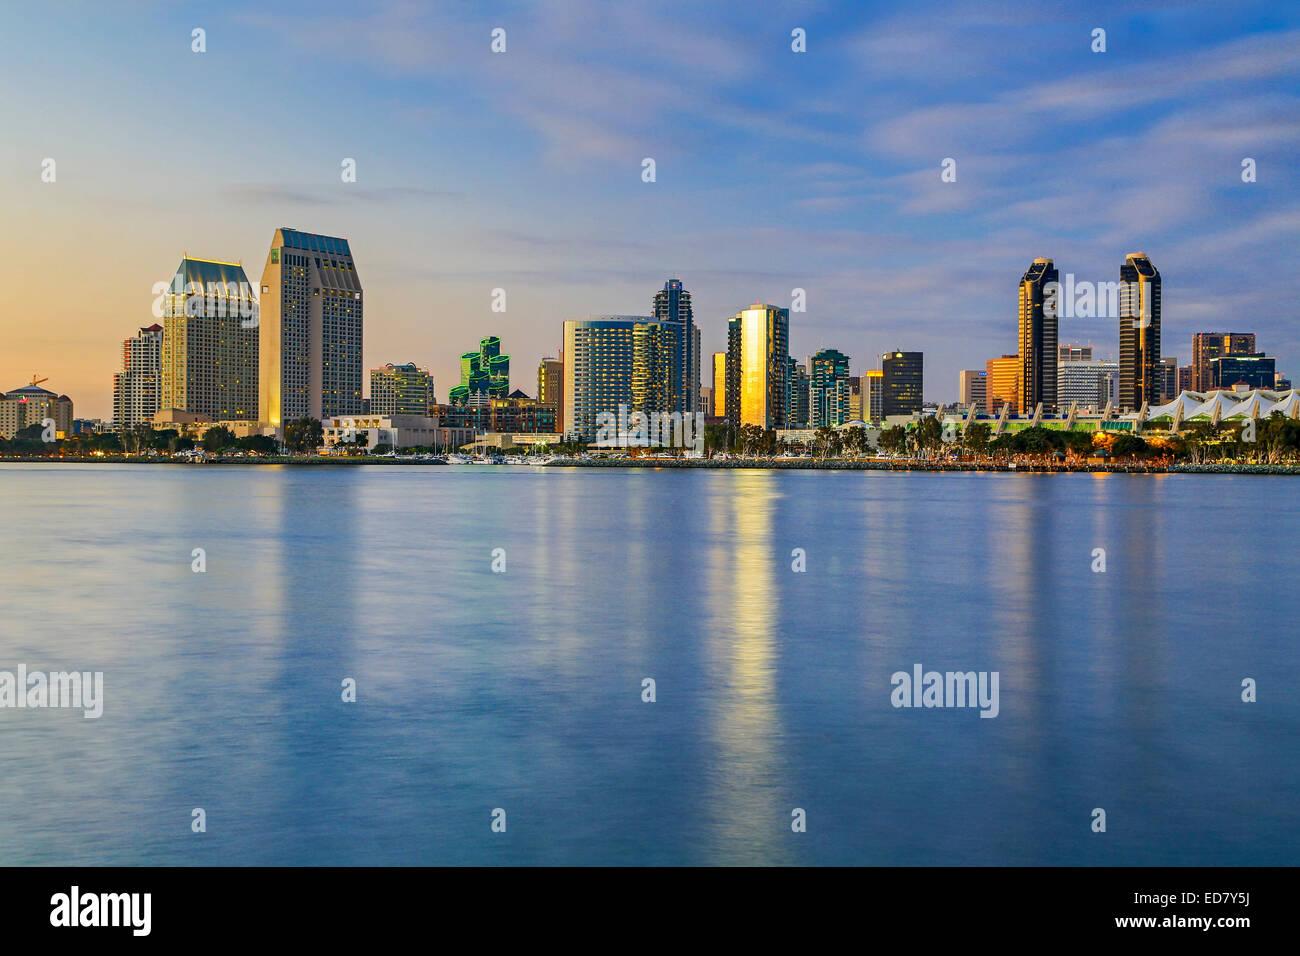 La ville et la baie de San Diego, San Diego, California USA Photo Stock